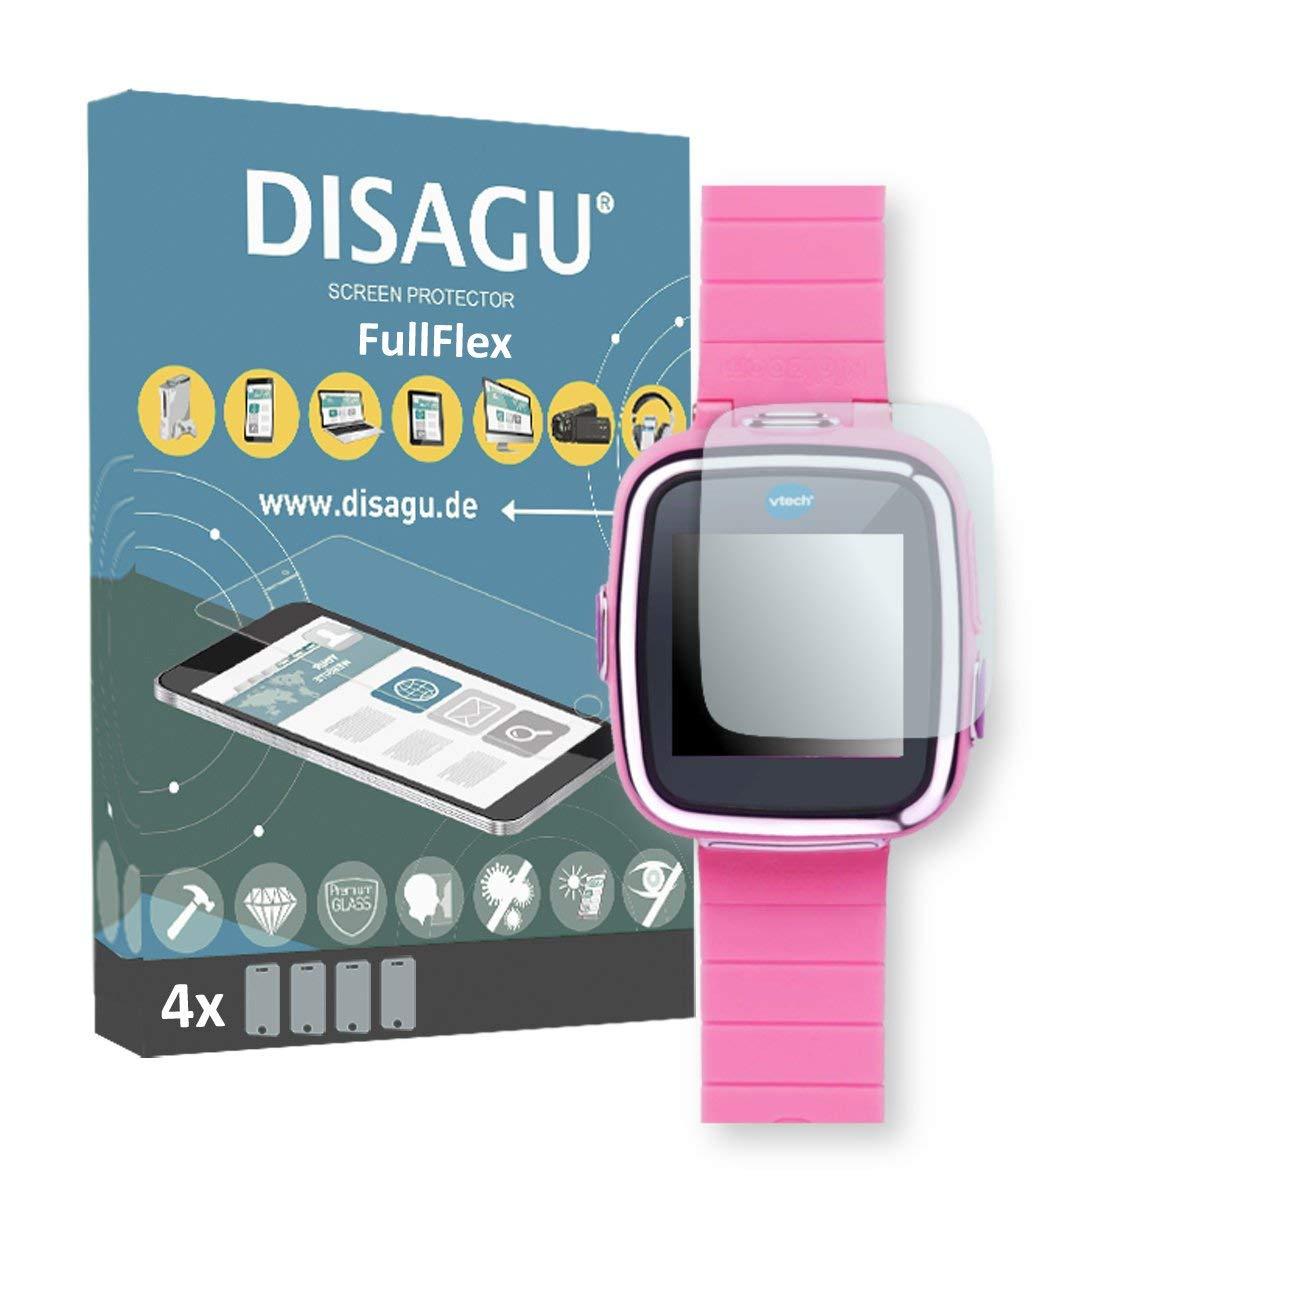 DISAGU 4 x FullFlex screen protector for Vtech Kidizoom Smart Watch 2 foil screen protector